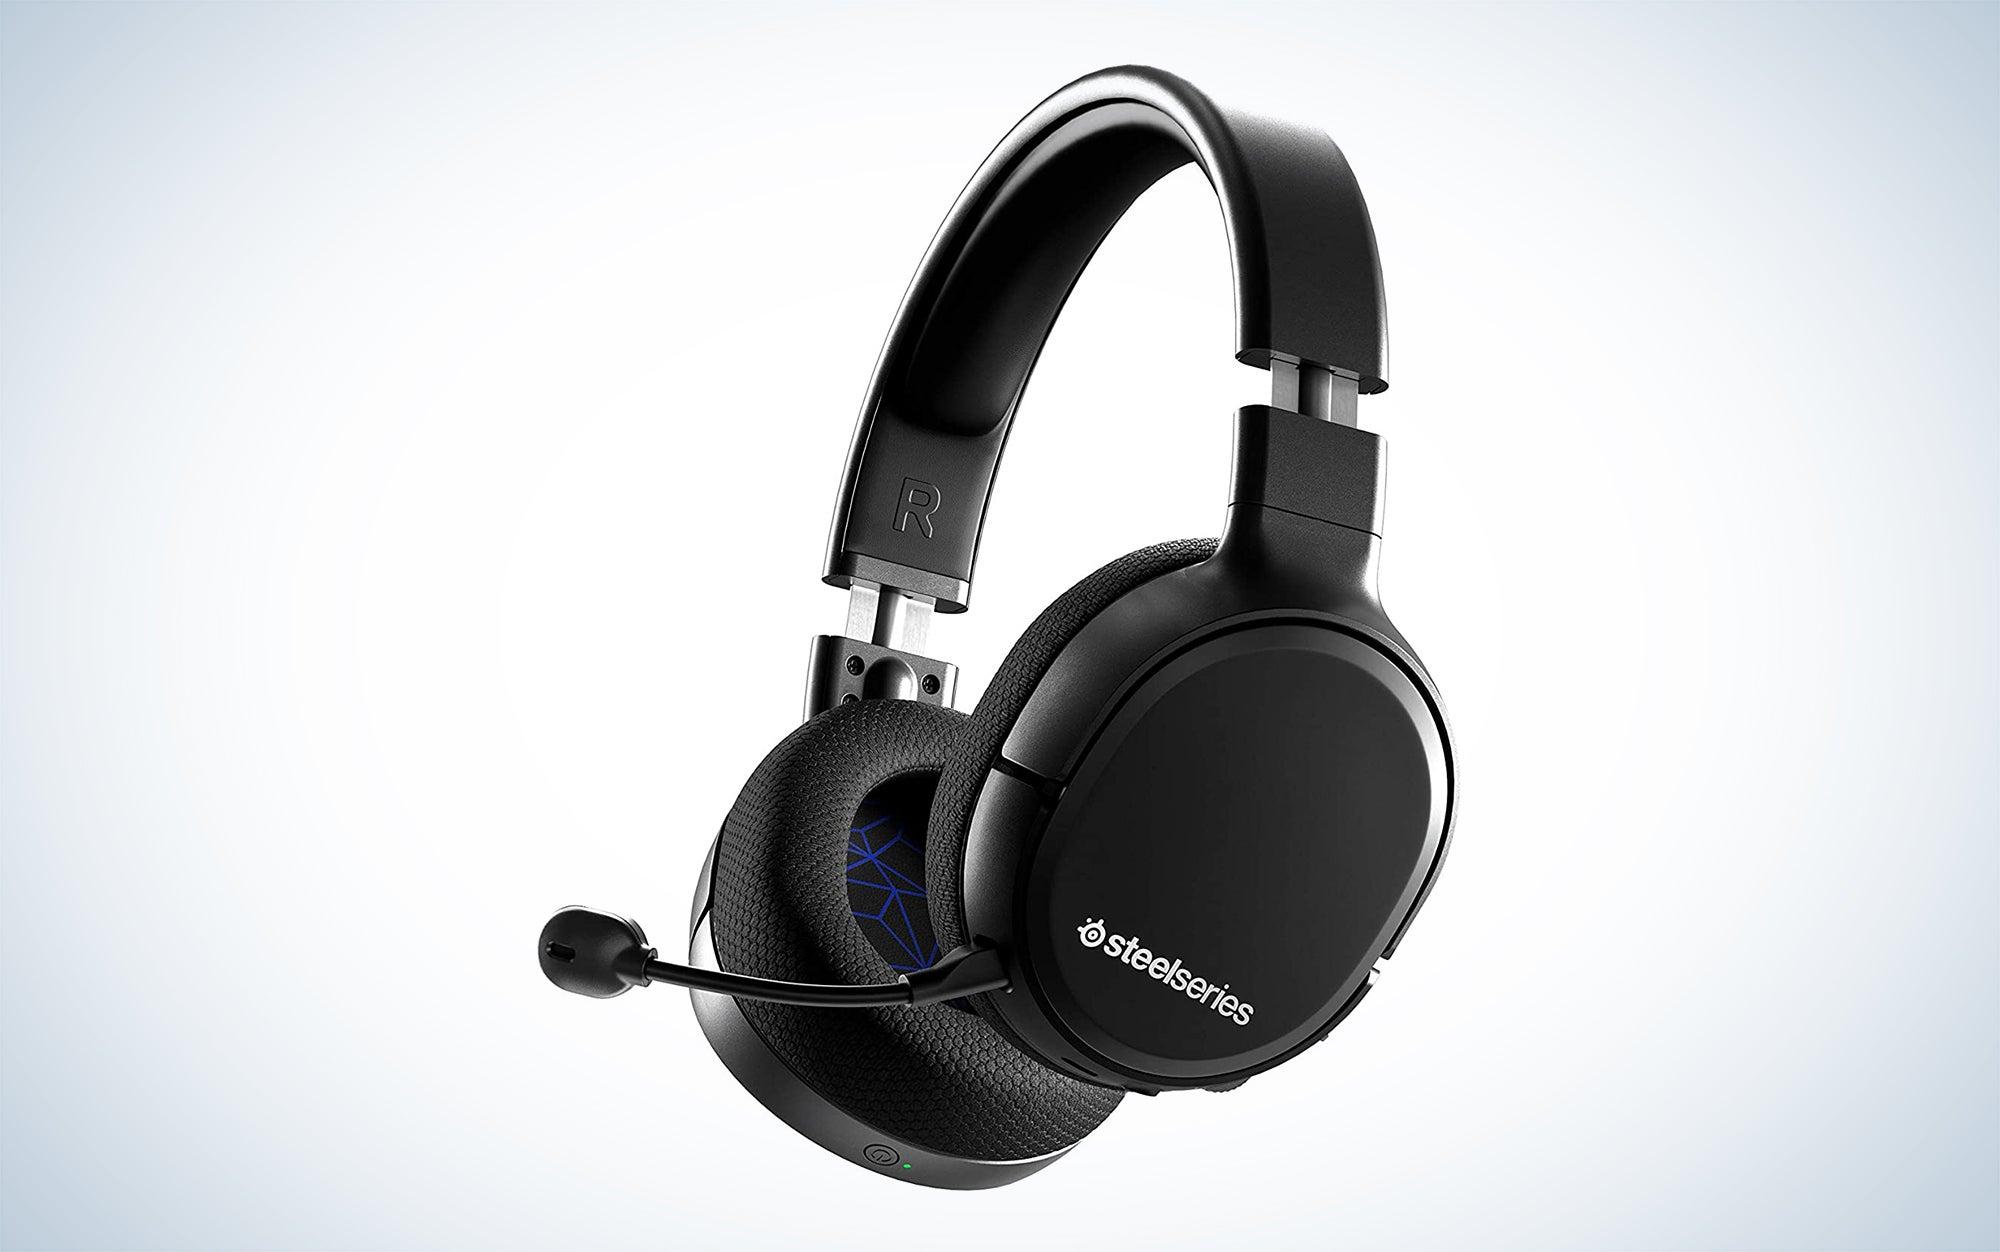 SteelSeries Arctis 1 Wireless Gaming Headset is one of the best wireless gaming headsets on the market.